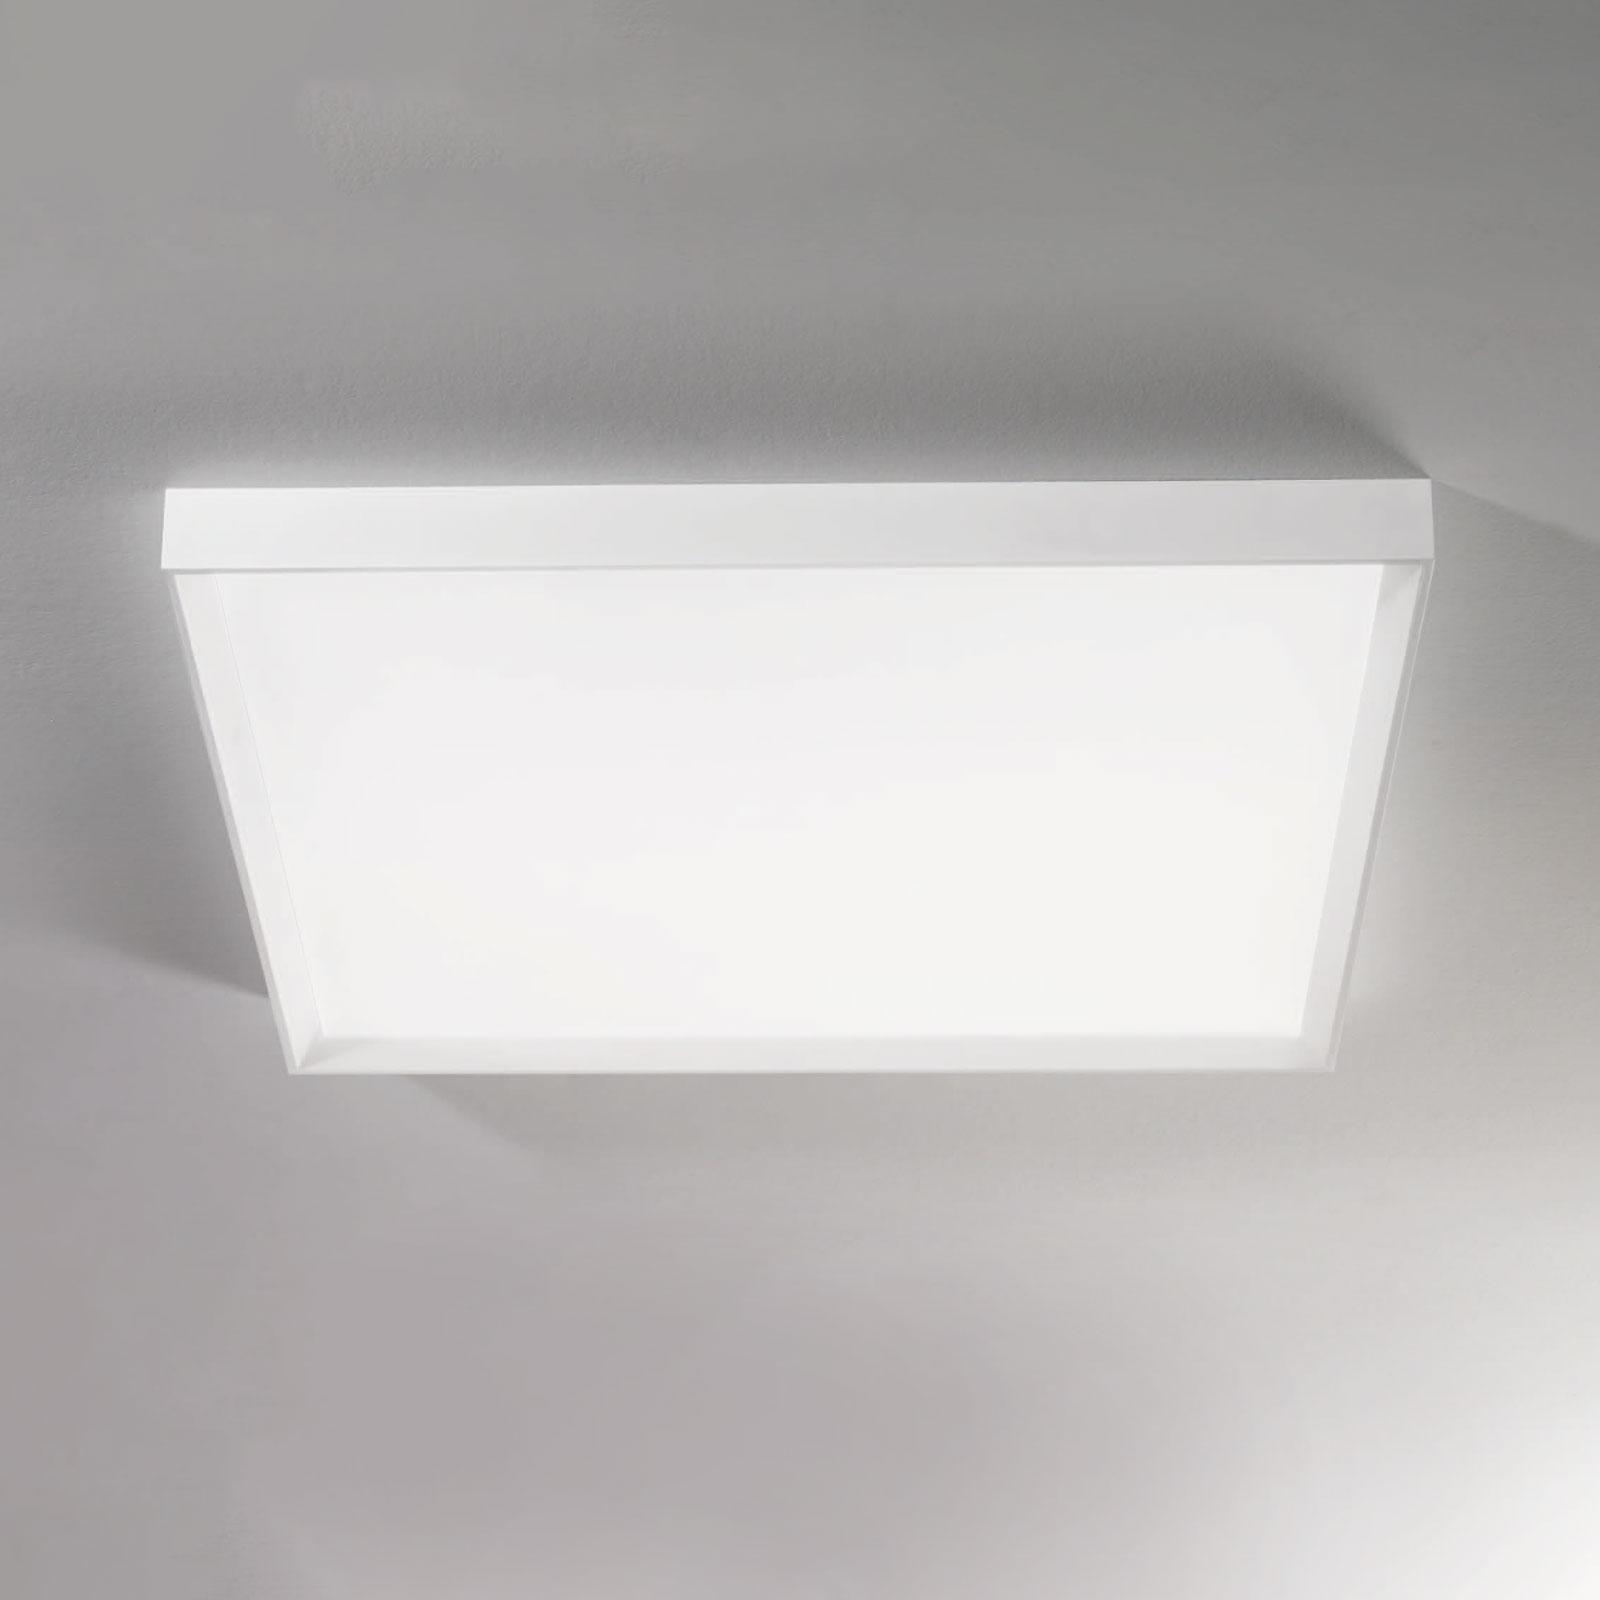 Lampa sufitowa LED Tara Maxi, 74 cm x 74 cm